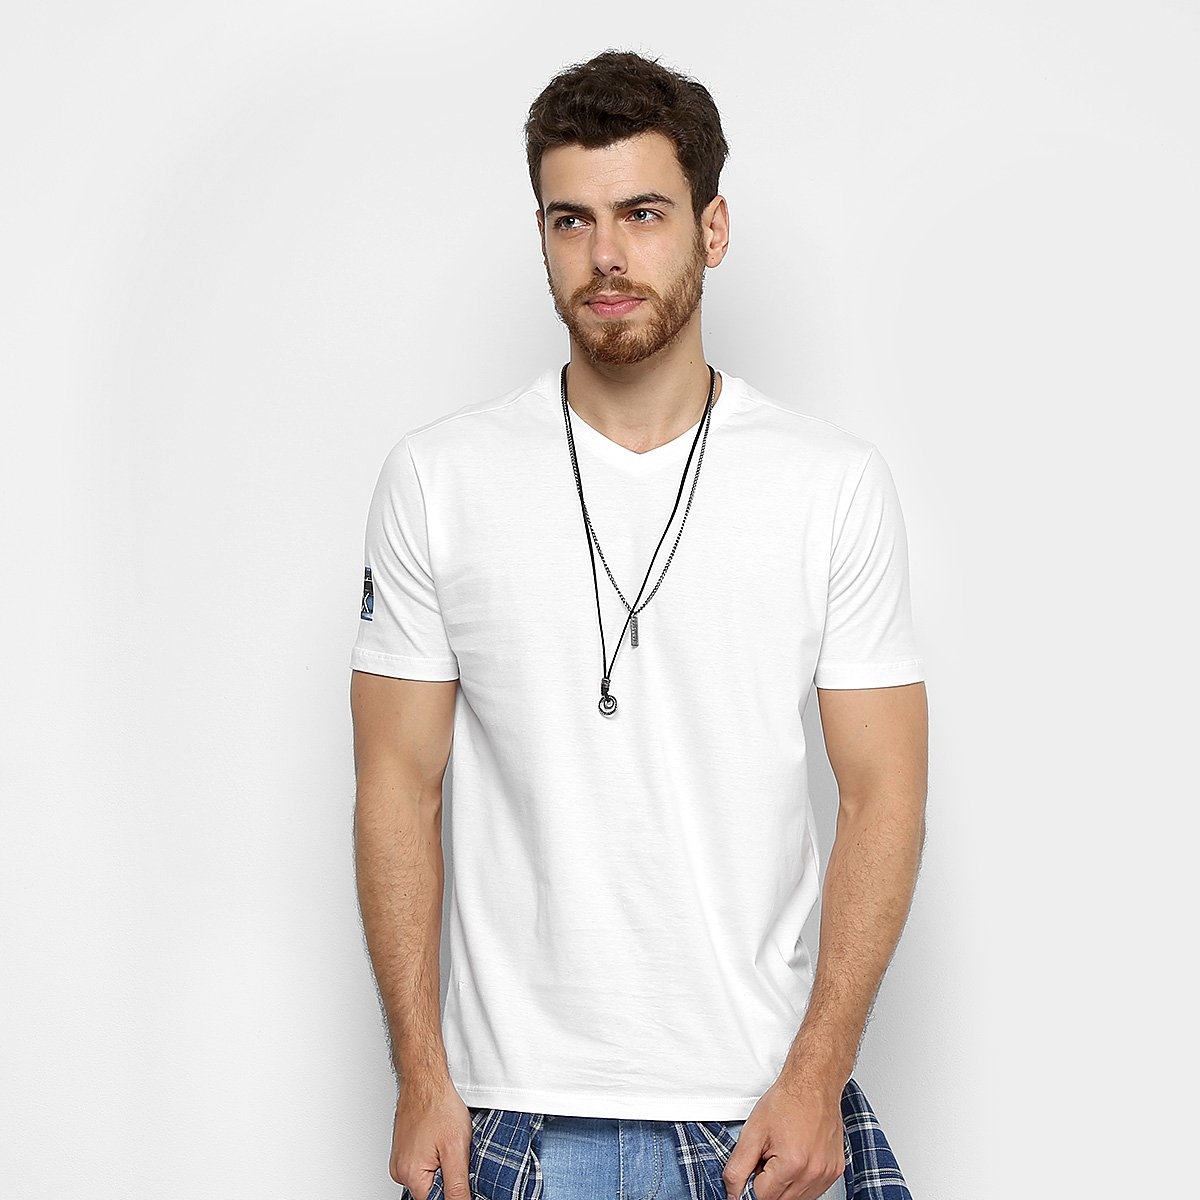 f4aef4bed5091 Camiseta Slim Calvin Klein Estampada Fita Masculina - Compre Agora ...